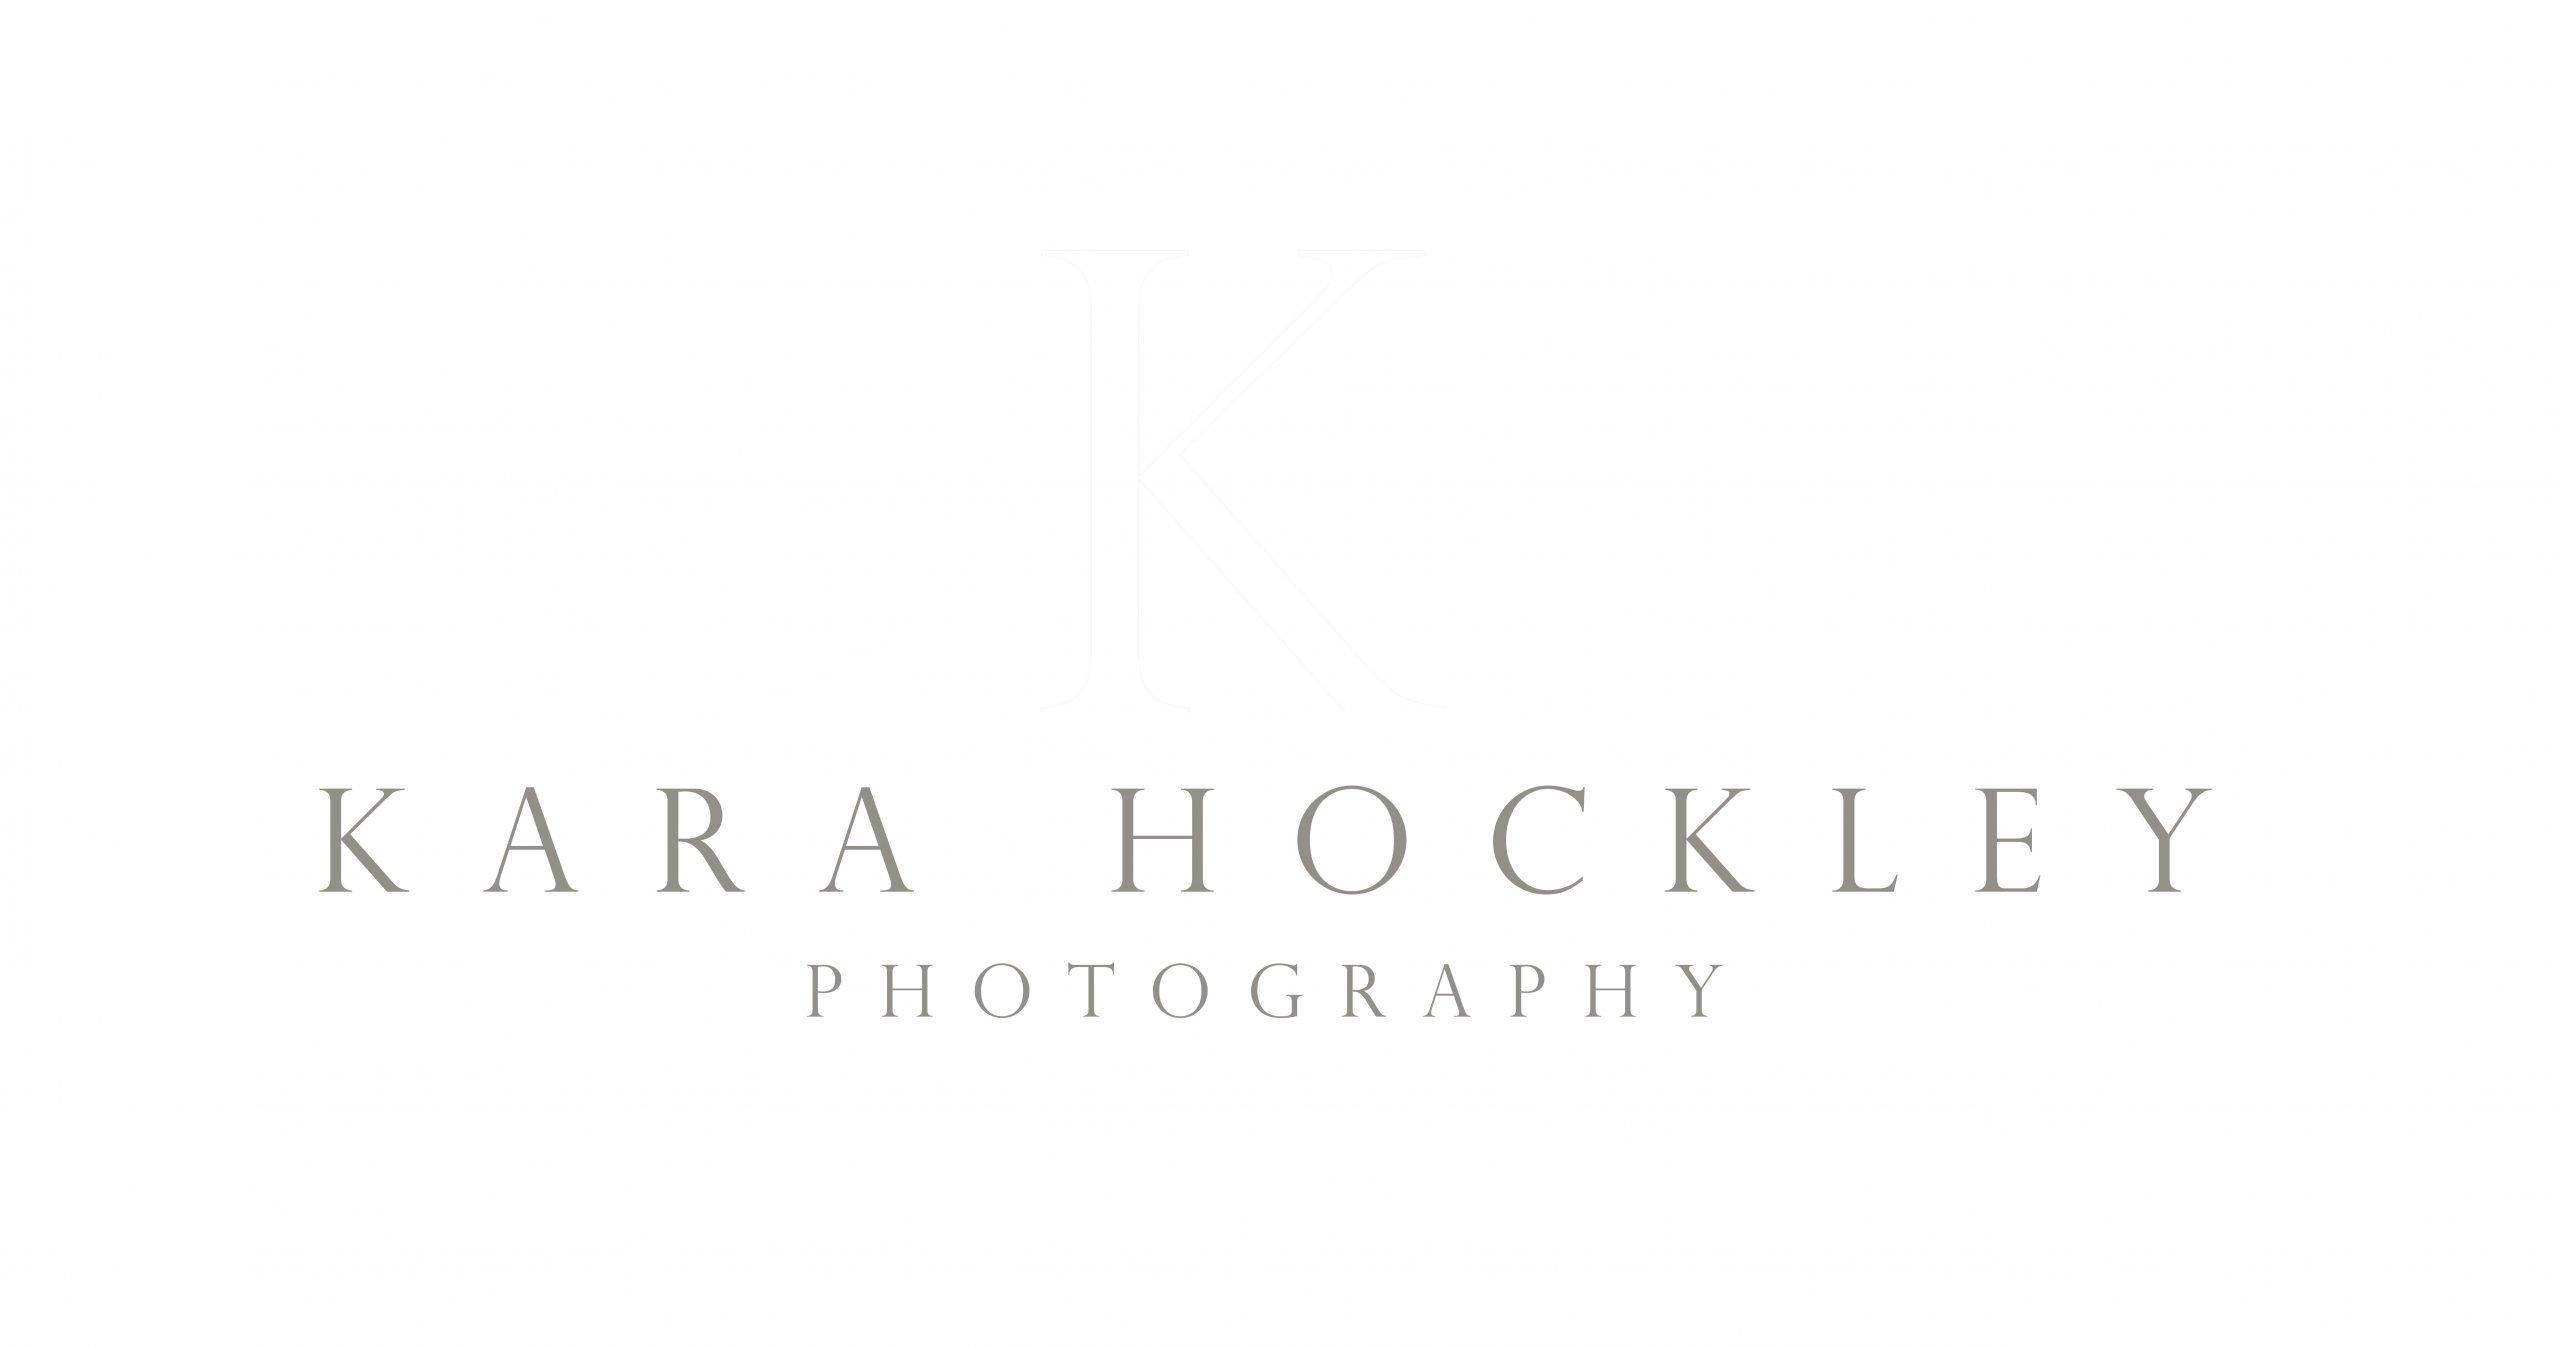 Kara Hockley Photography